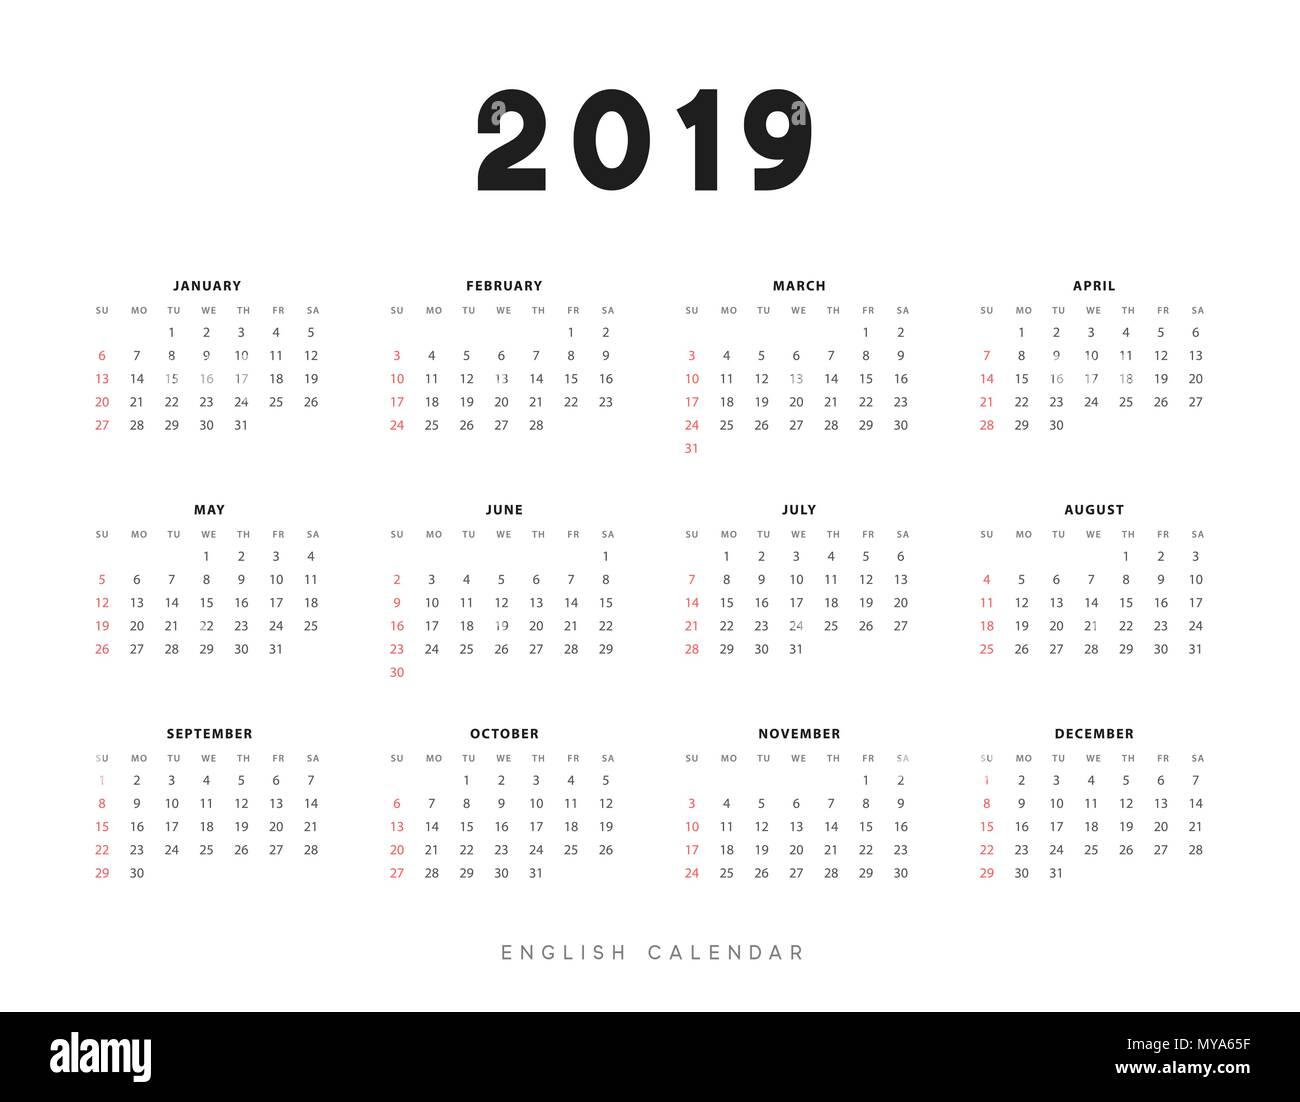 Calendario 2019 Con Numero Week.Simple English Calendar For 2019 Years Week Starts From